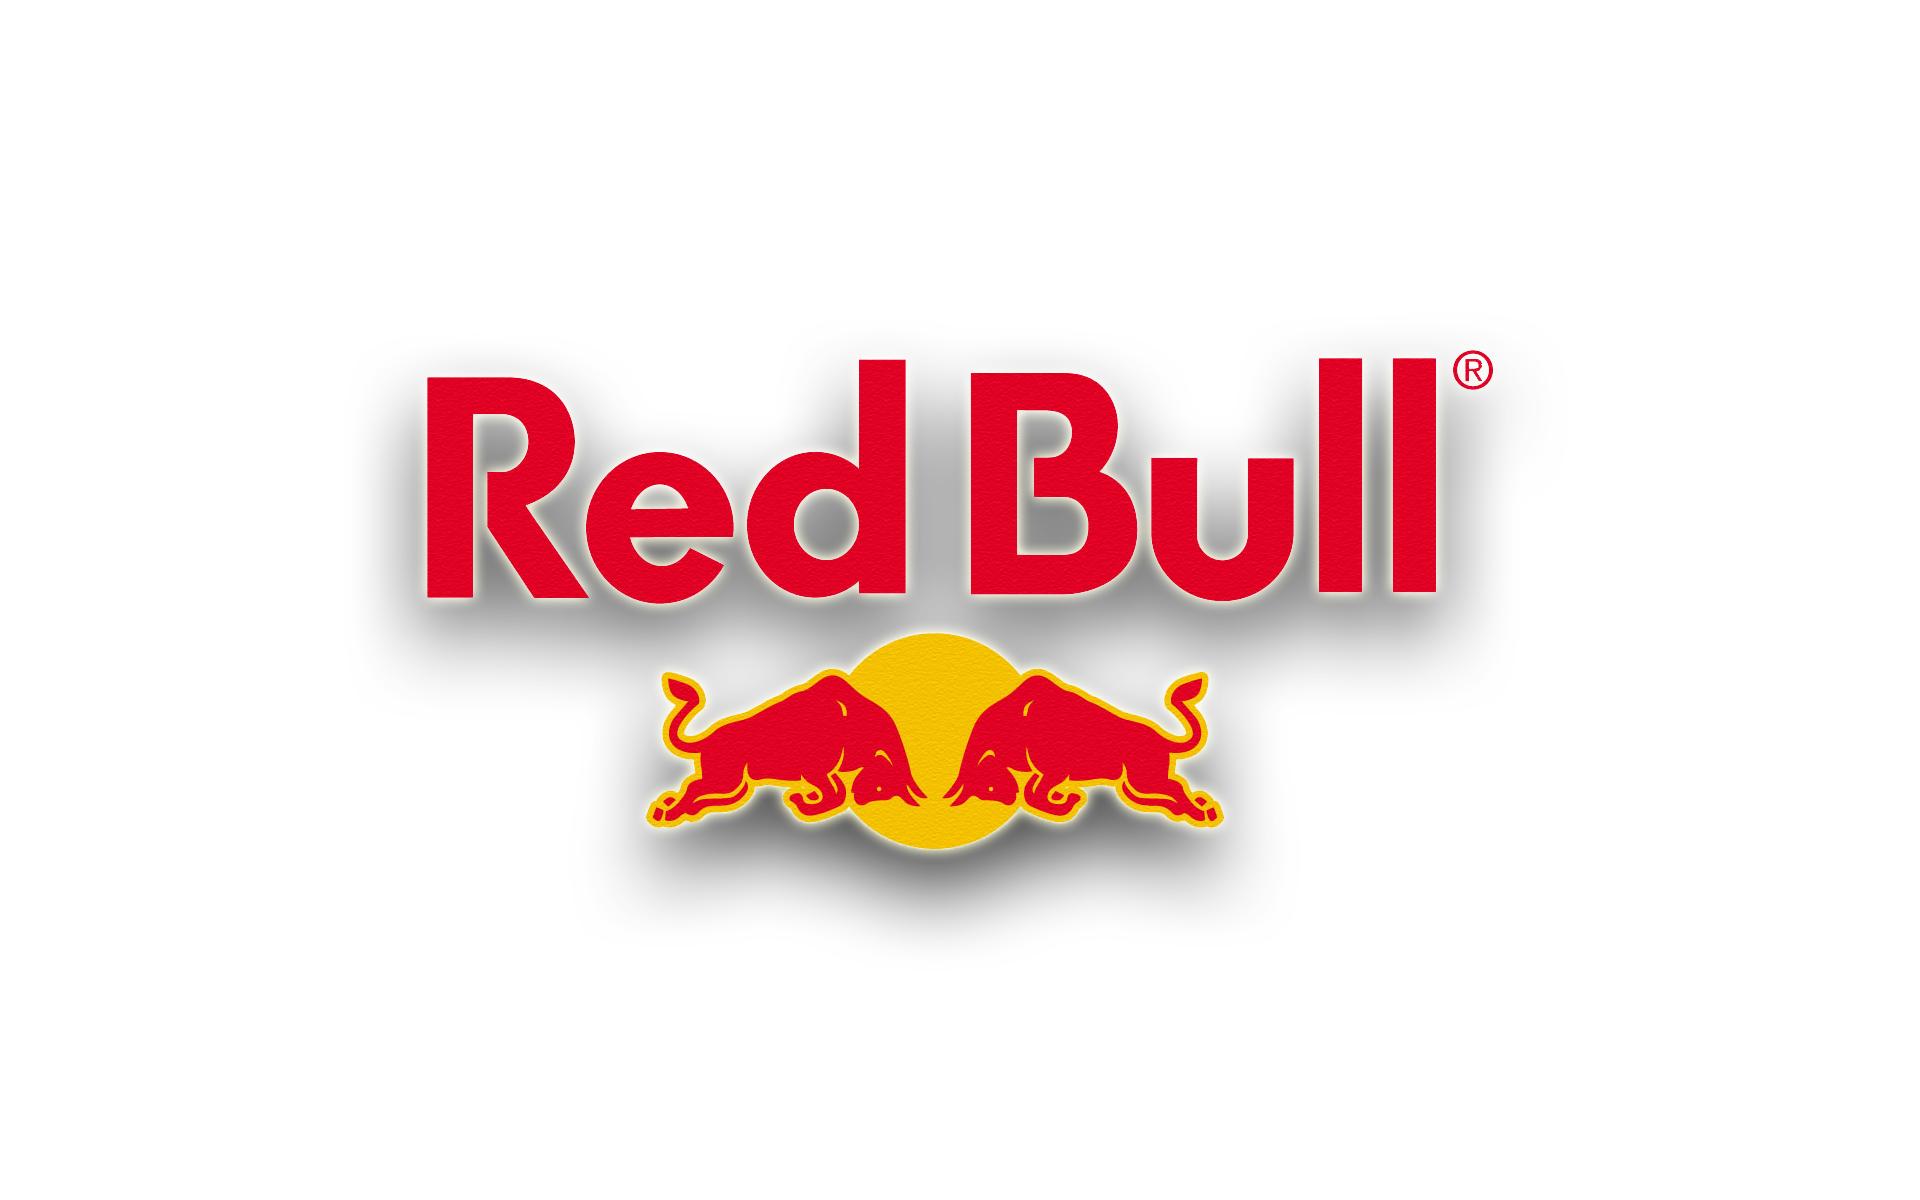 Red Bull HD Wallpapers Drink Red Bull Desktop Wallpapers Drink Red 1920x1200